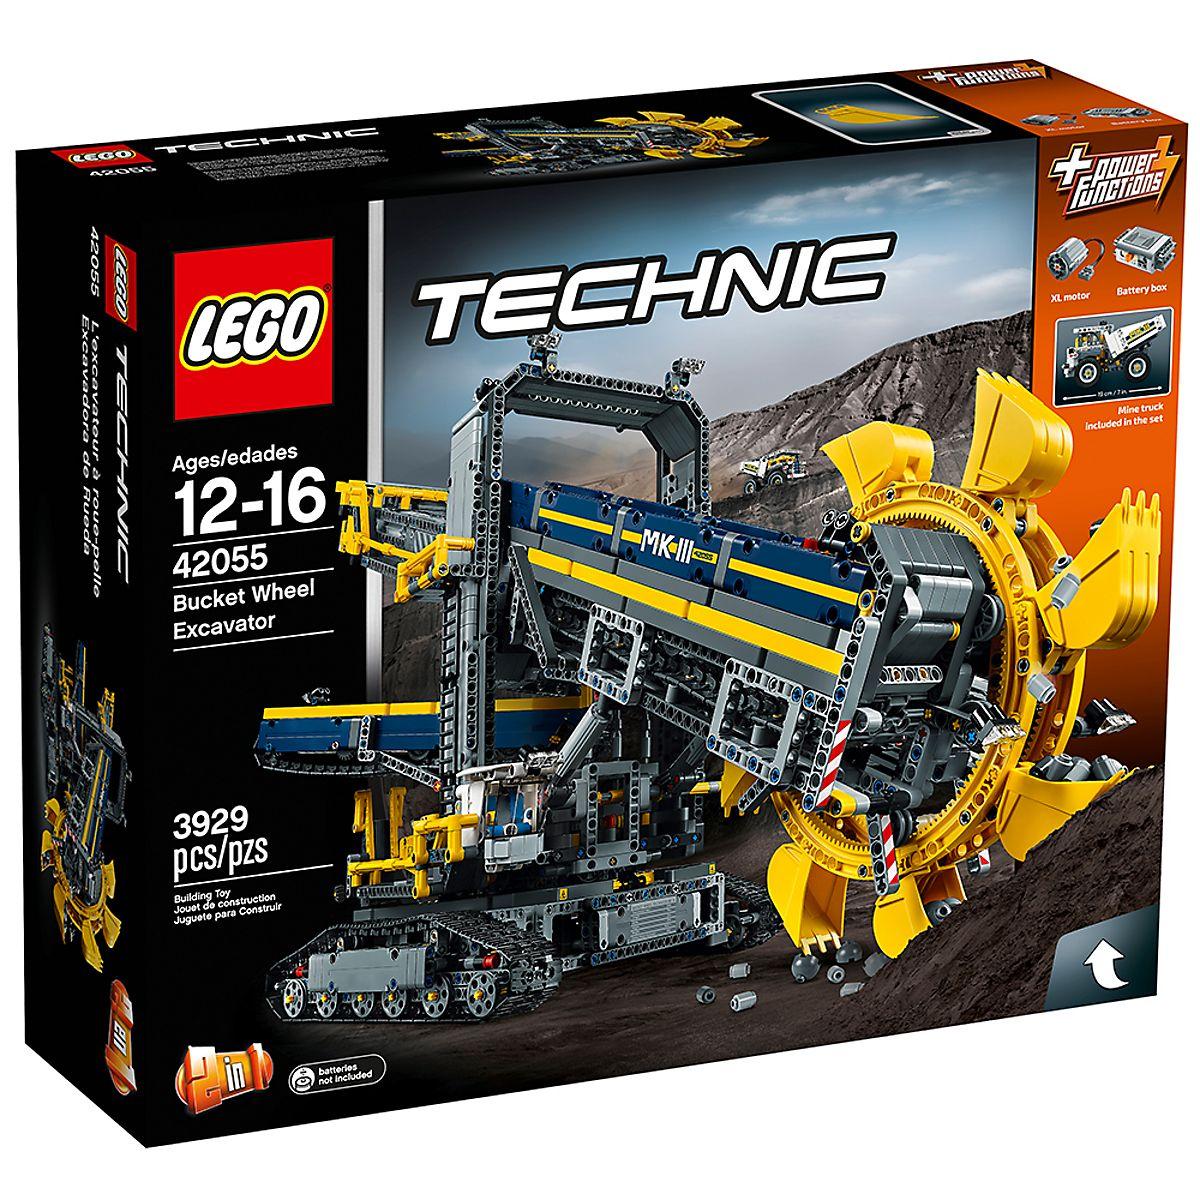 Bucket Wheel Excavator 42055 | Technic™ | Buy online at the Official LEGO®  Shop US